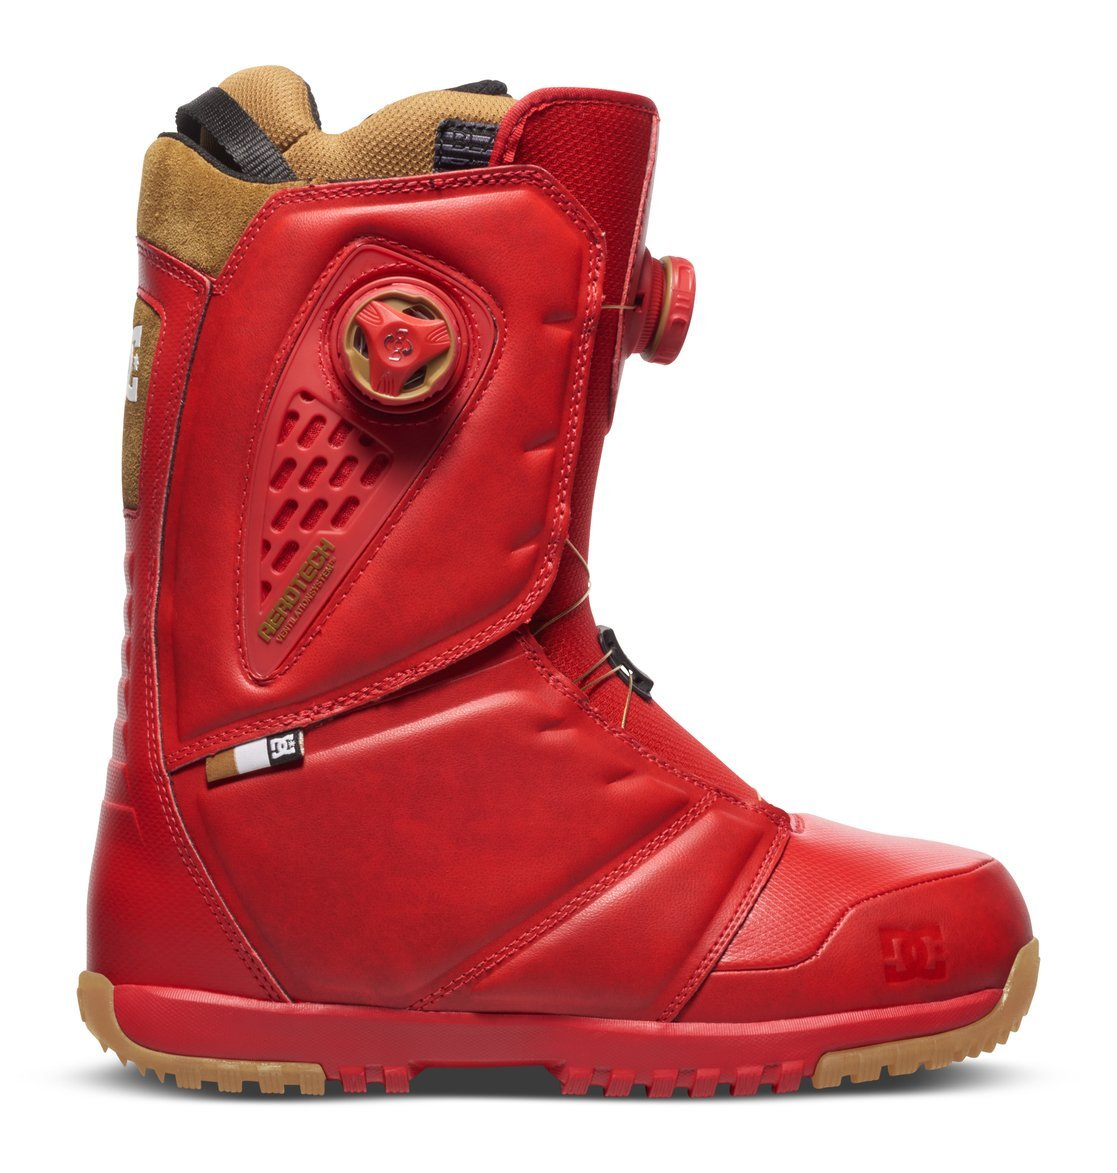 DC Shoes Mens Shoes Judge Snowboard Boots Red Racing Red US 7.5 // UK 6.5 // EU 40 Men US 7.5